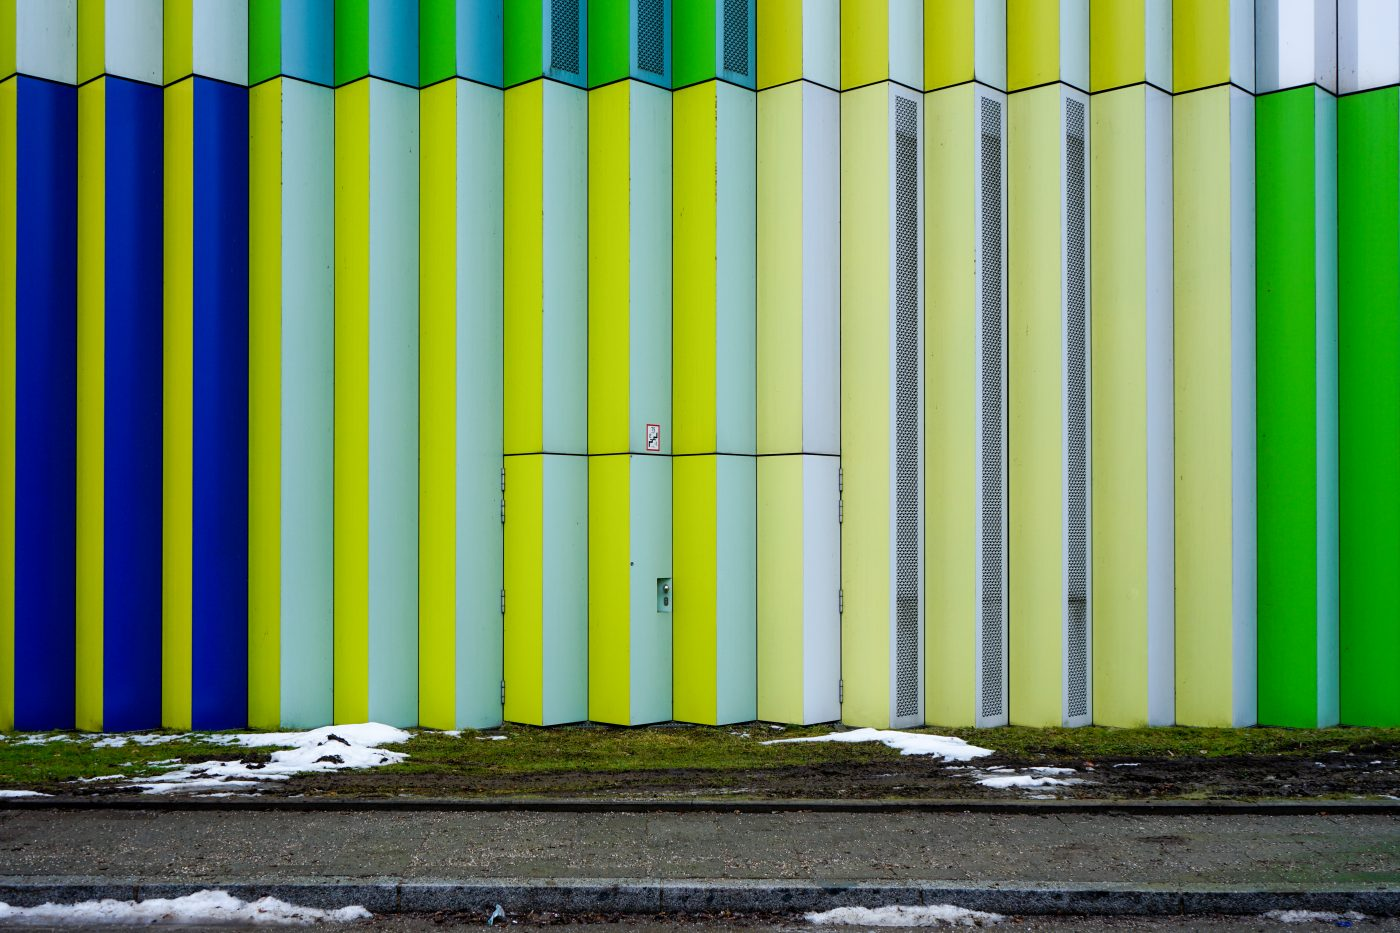 By the roadside # 1308 Munich (MIRA Shoppingcenter Part 2)